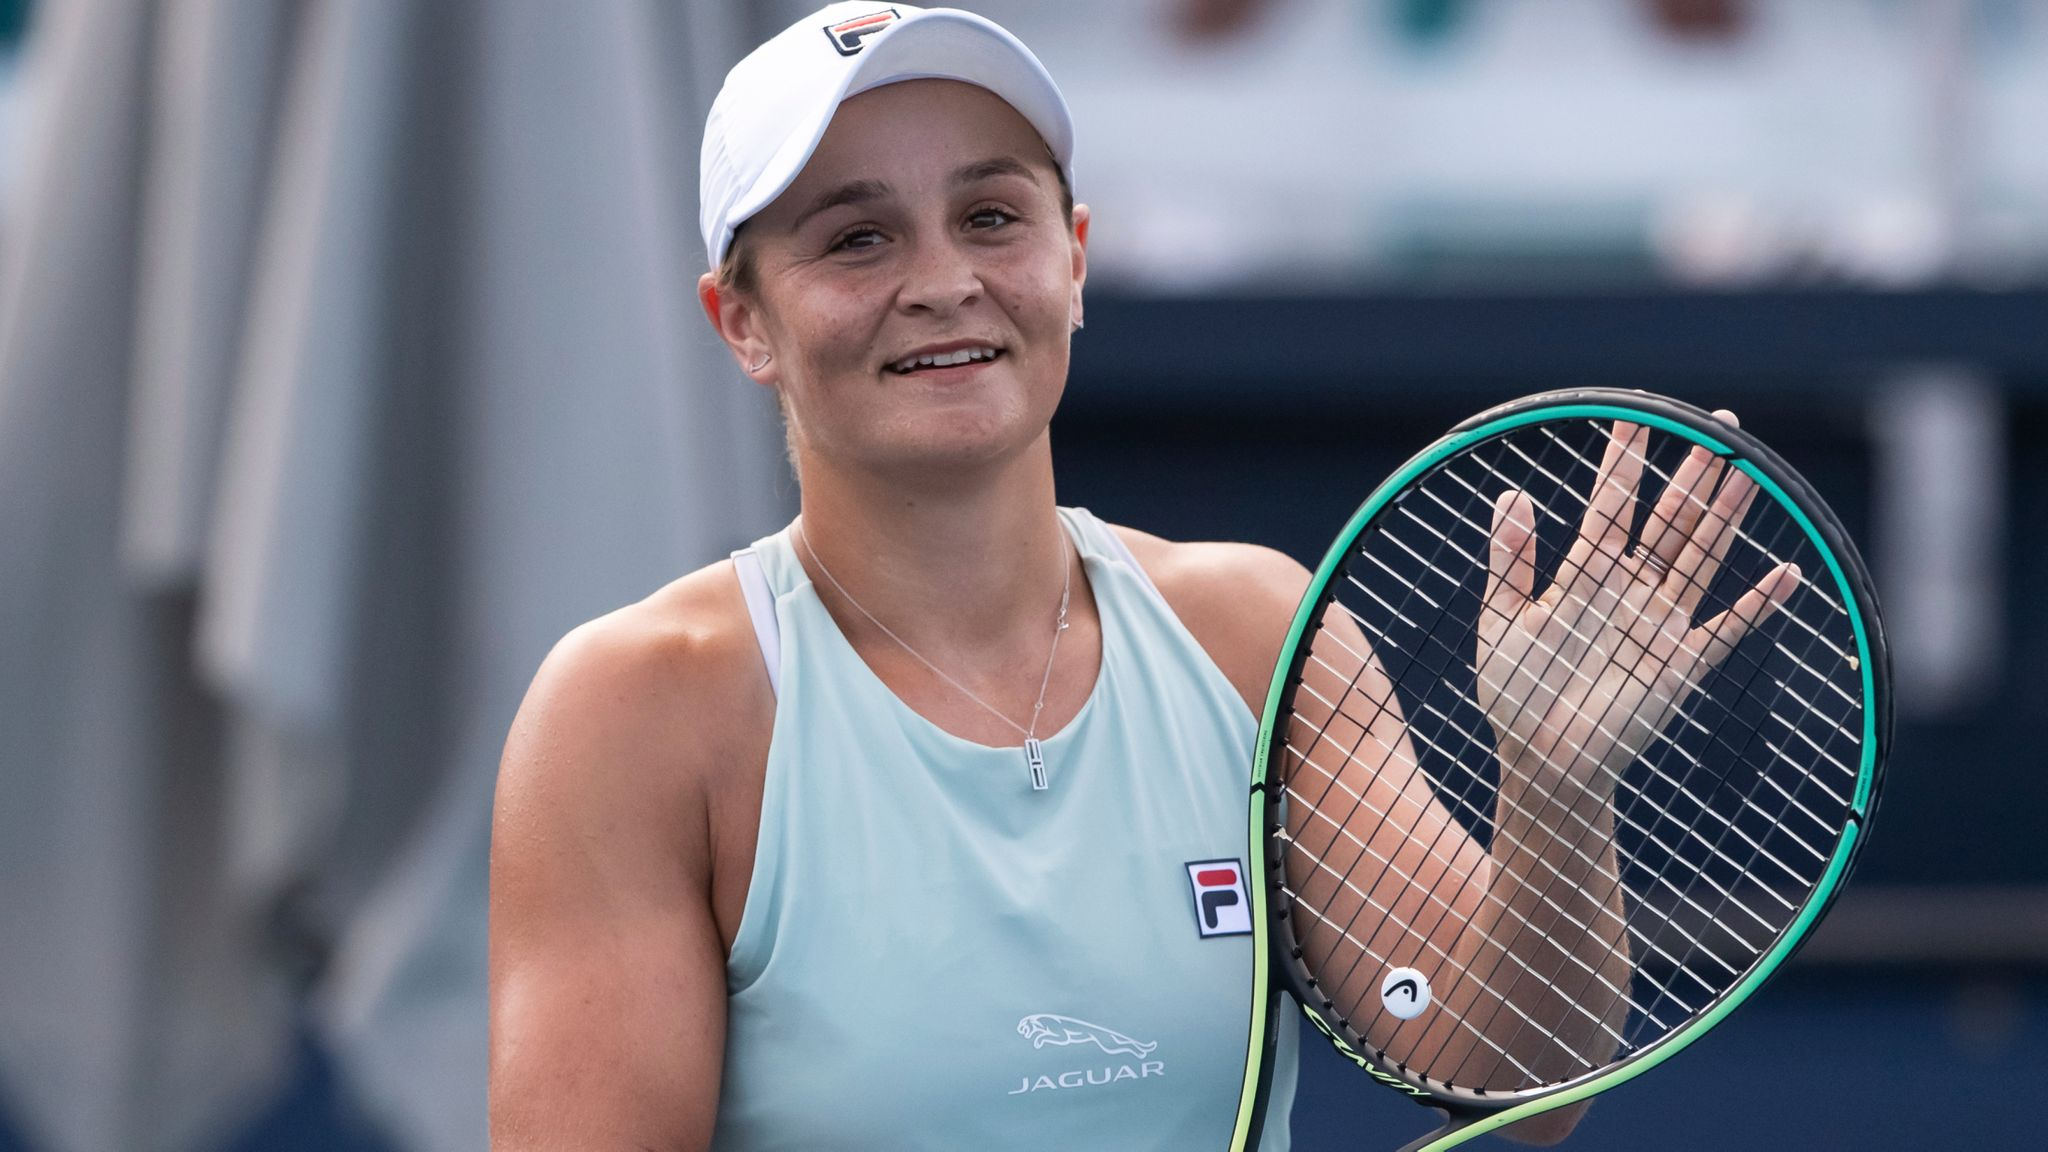 Roland Garros 2021: Ashleigh Barty vs. Magda Linette Tennis Pick and Prediction